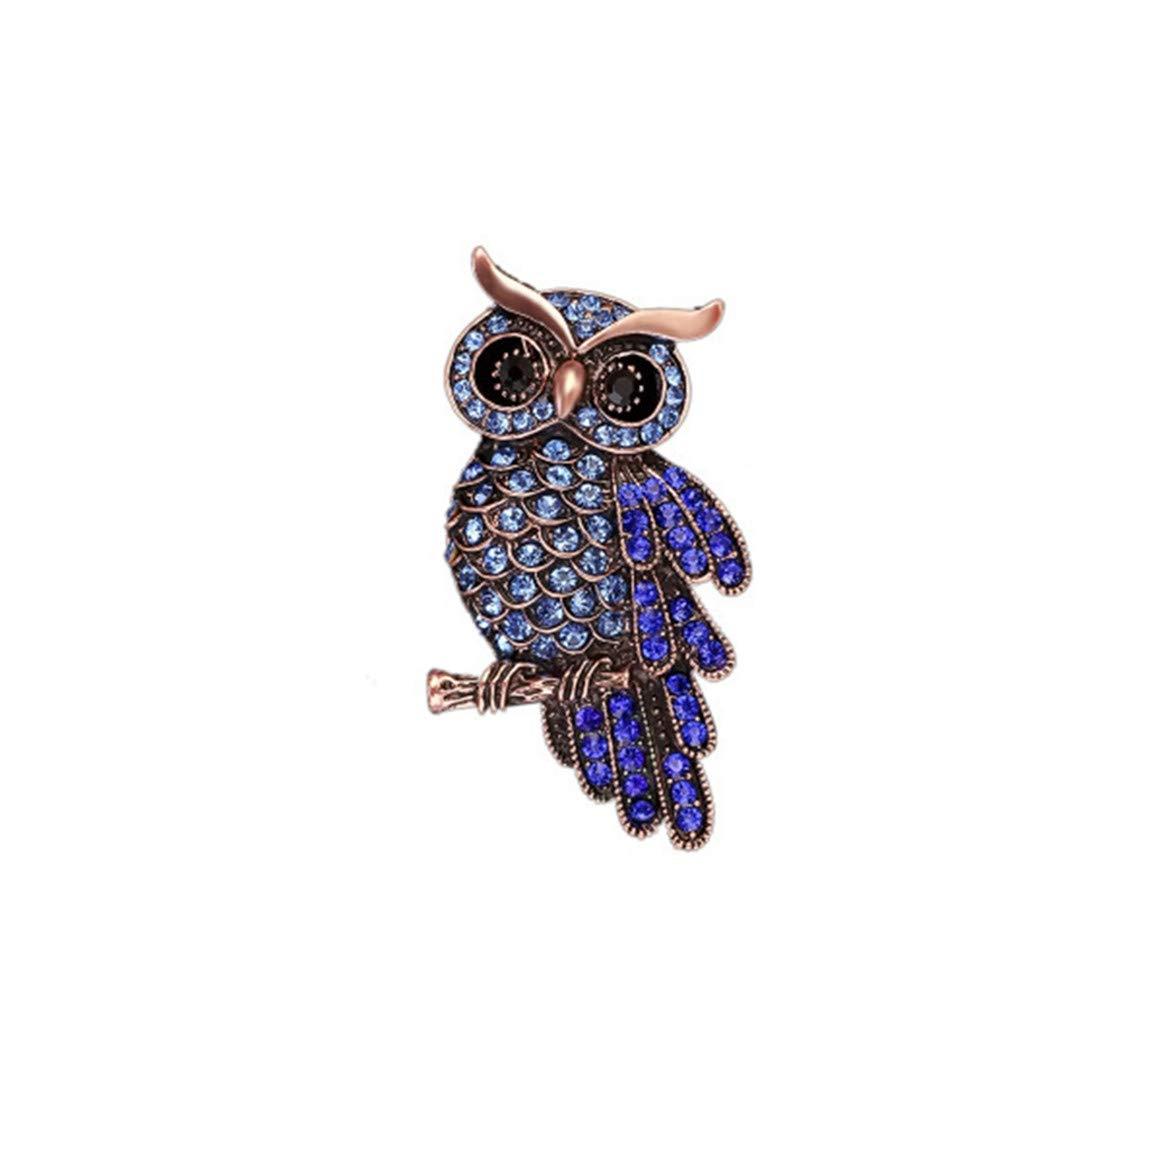 WEIHEE Brooch Pins Elegant Hollow Rhinestone Brooches Wedding Owl Designed Brooch Pin Clothes Lapel Pin Badges